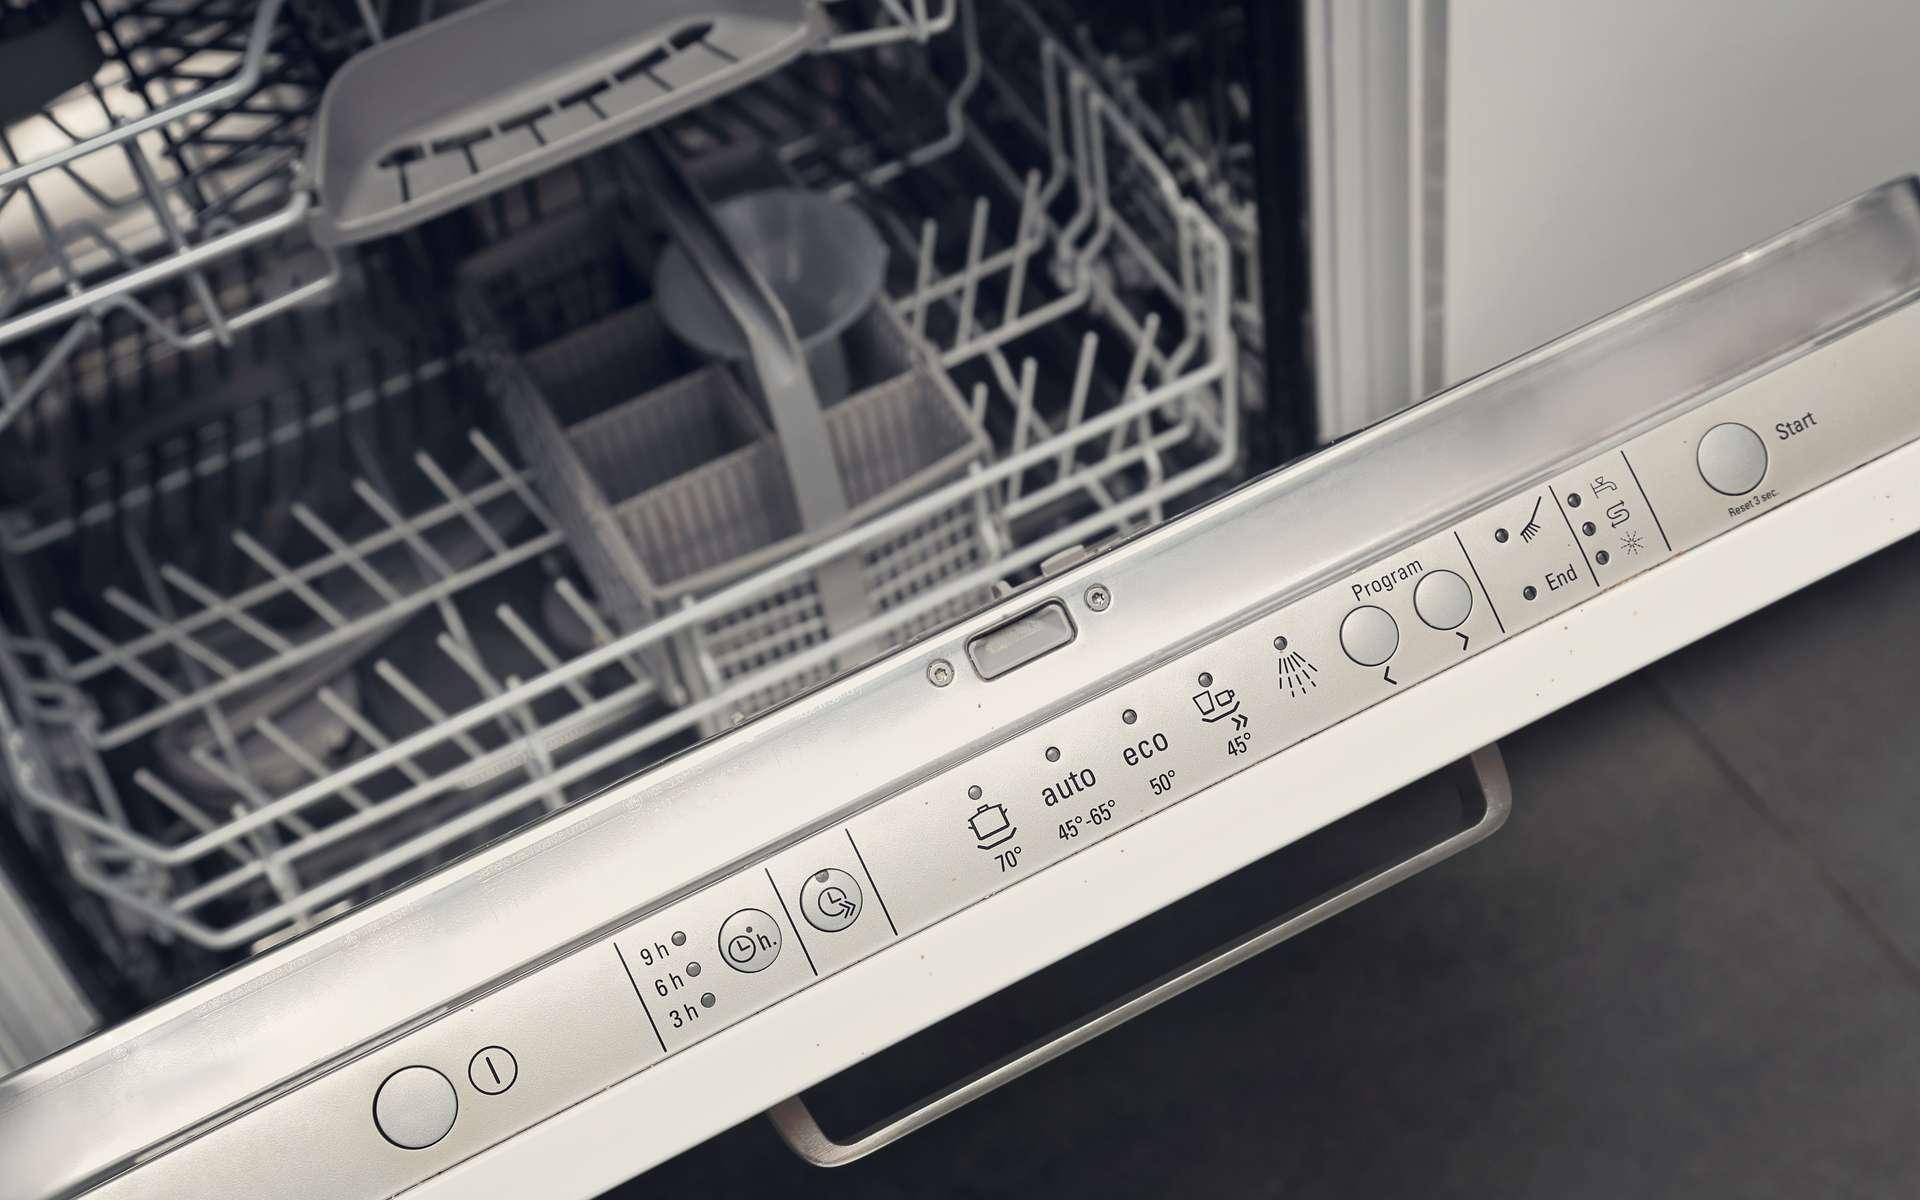 Un nettoyage régulier est indispensable. © Mariesacha, Adobe Stock